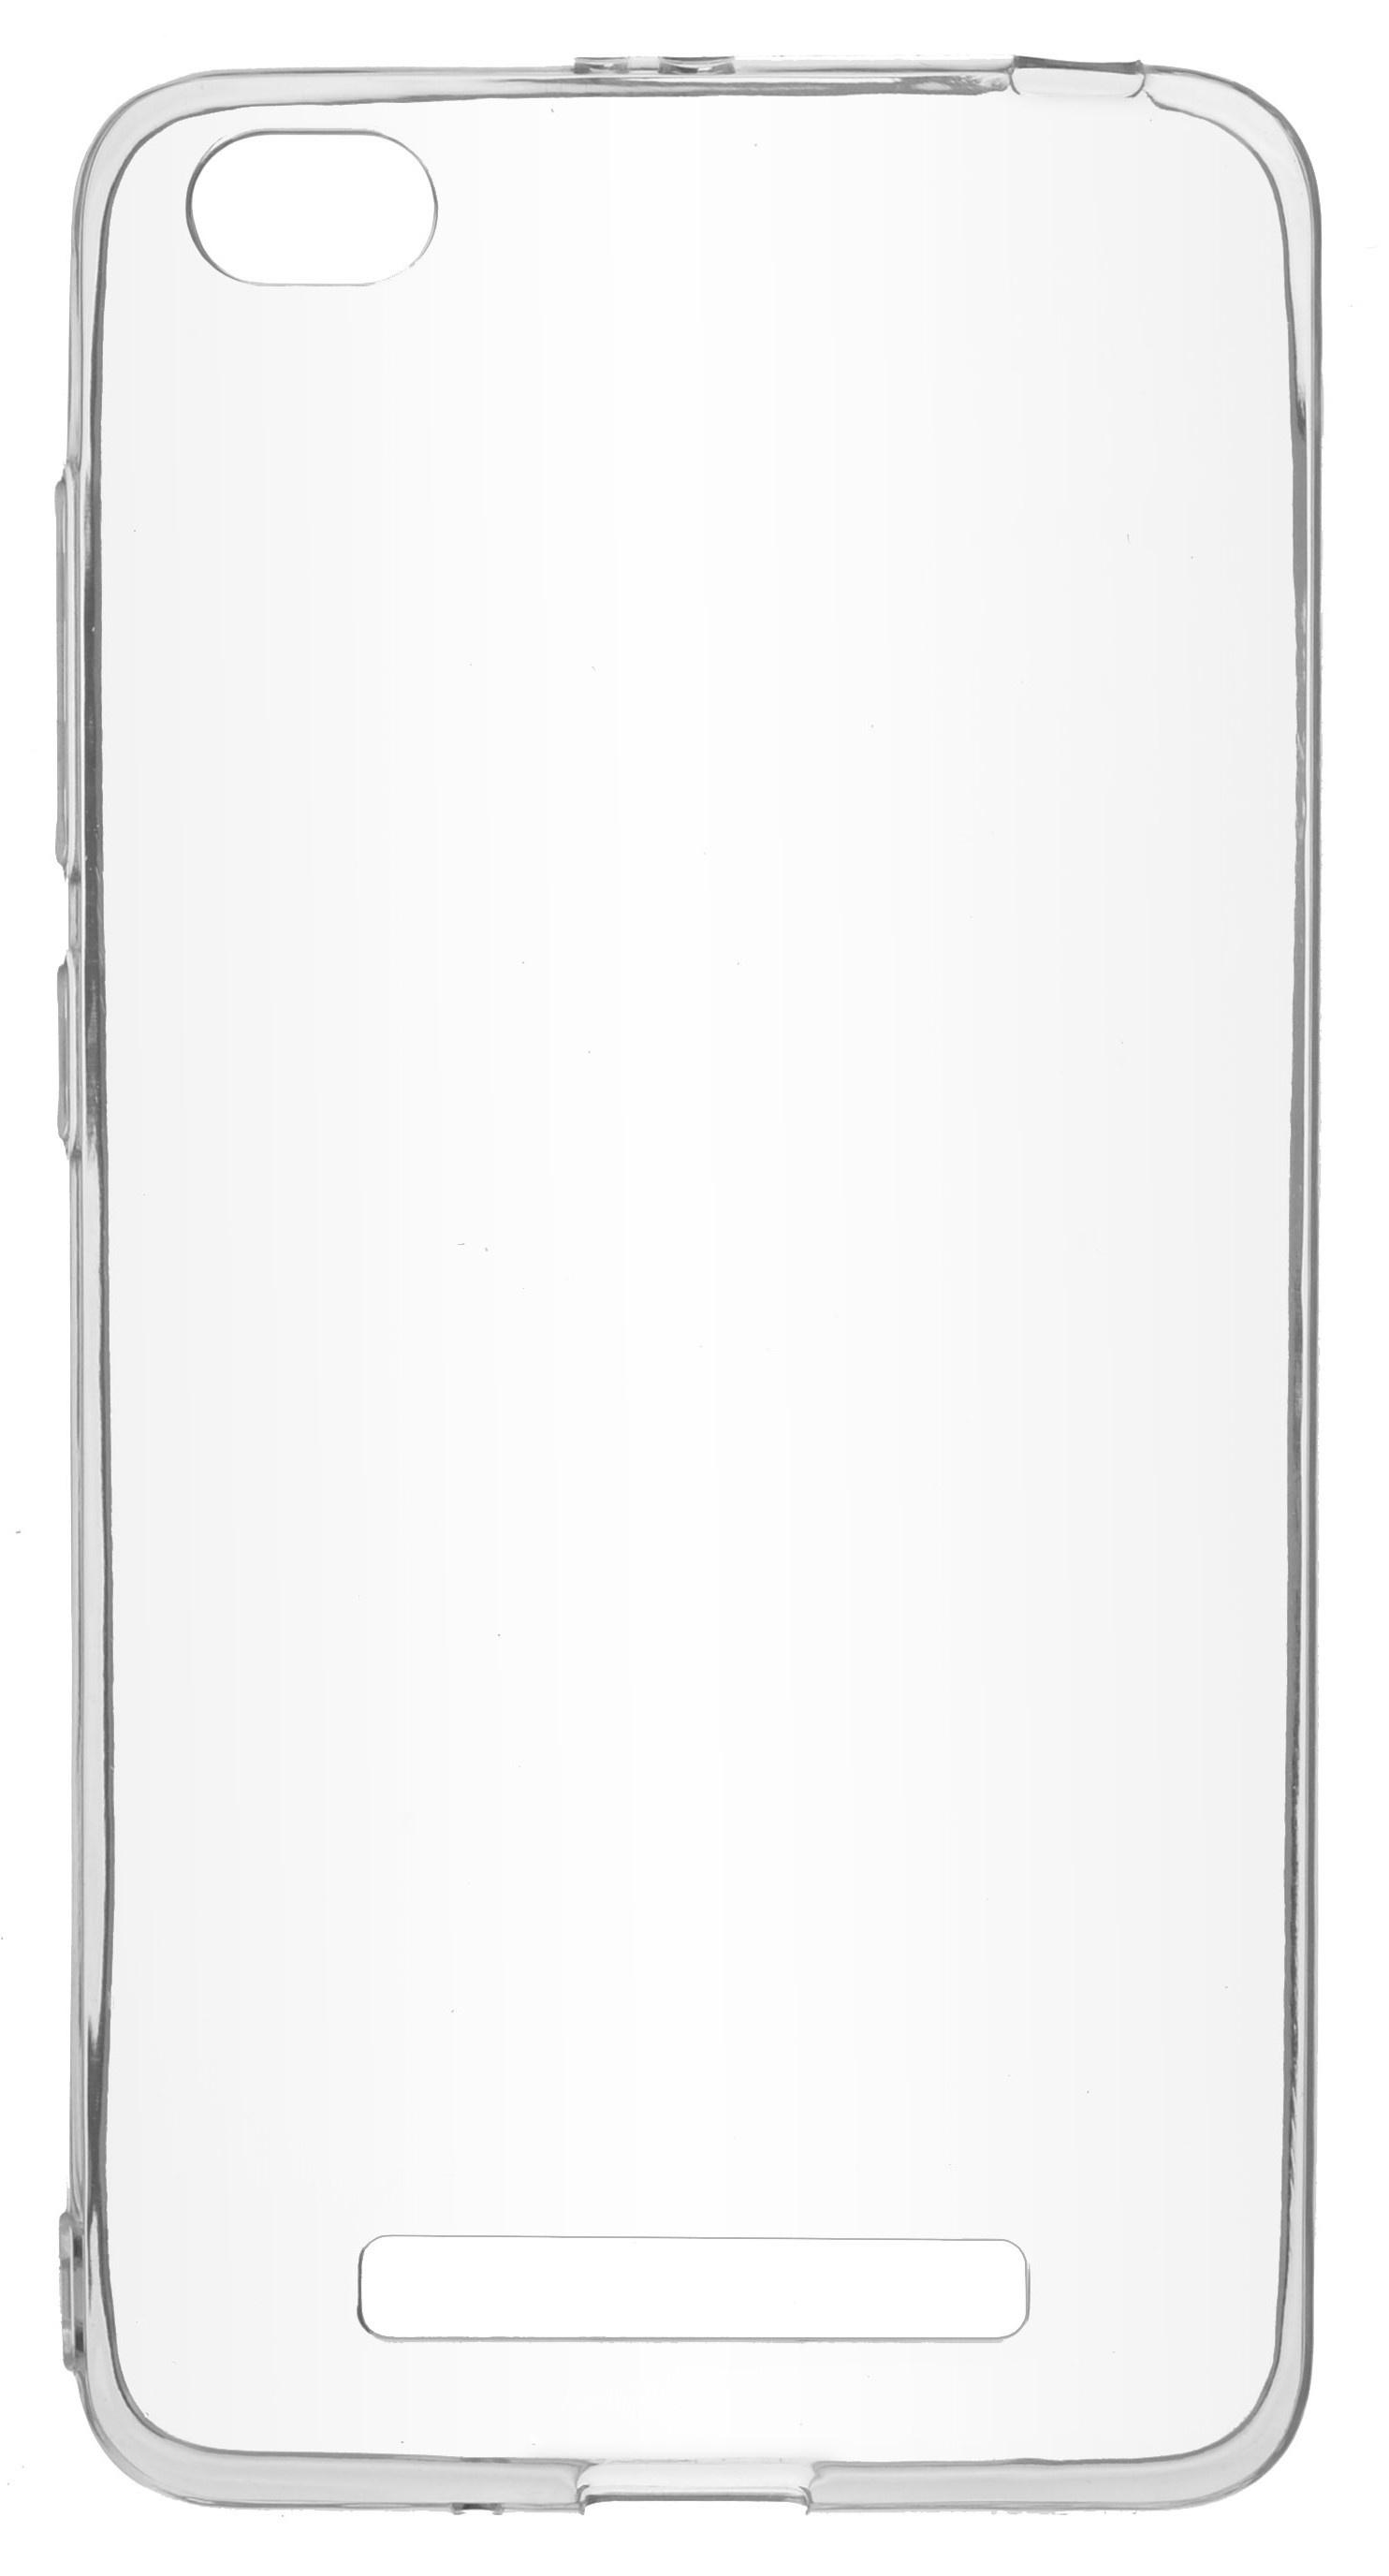 Чехол для сотового телефона skinBOX Slim Silicone, 4630042529373, прозрачный цена и фото